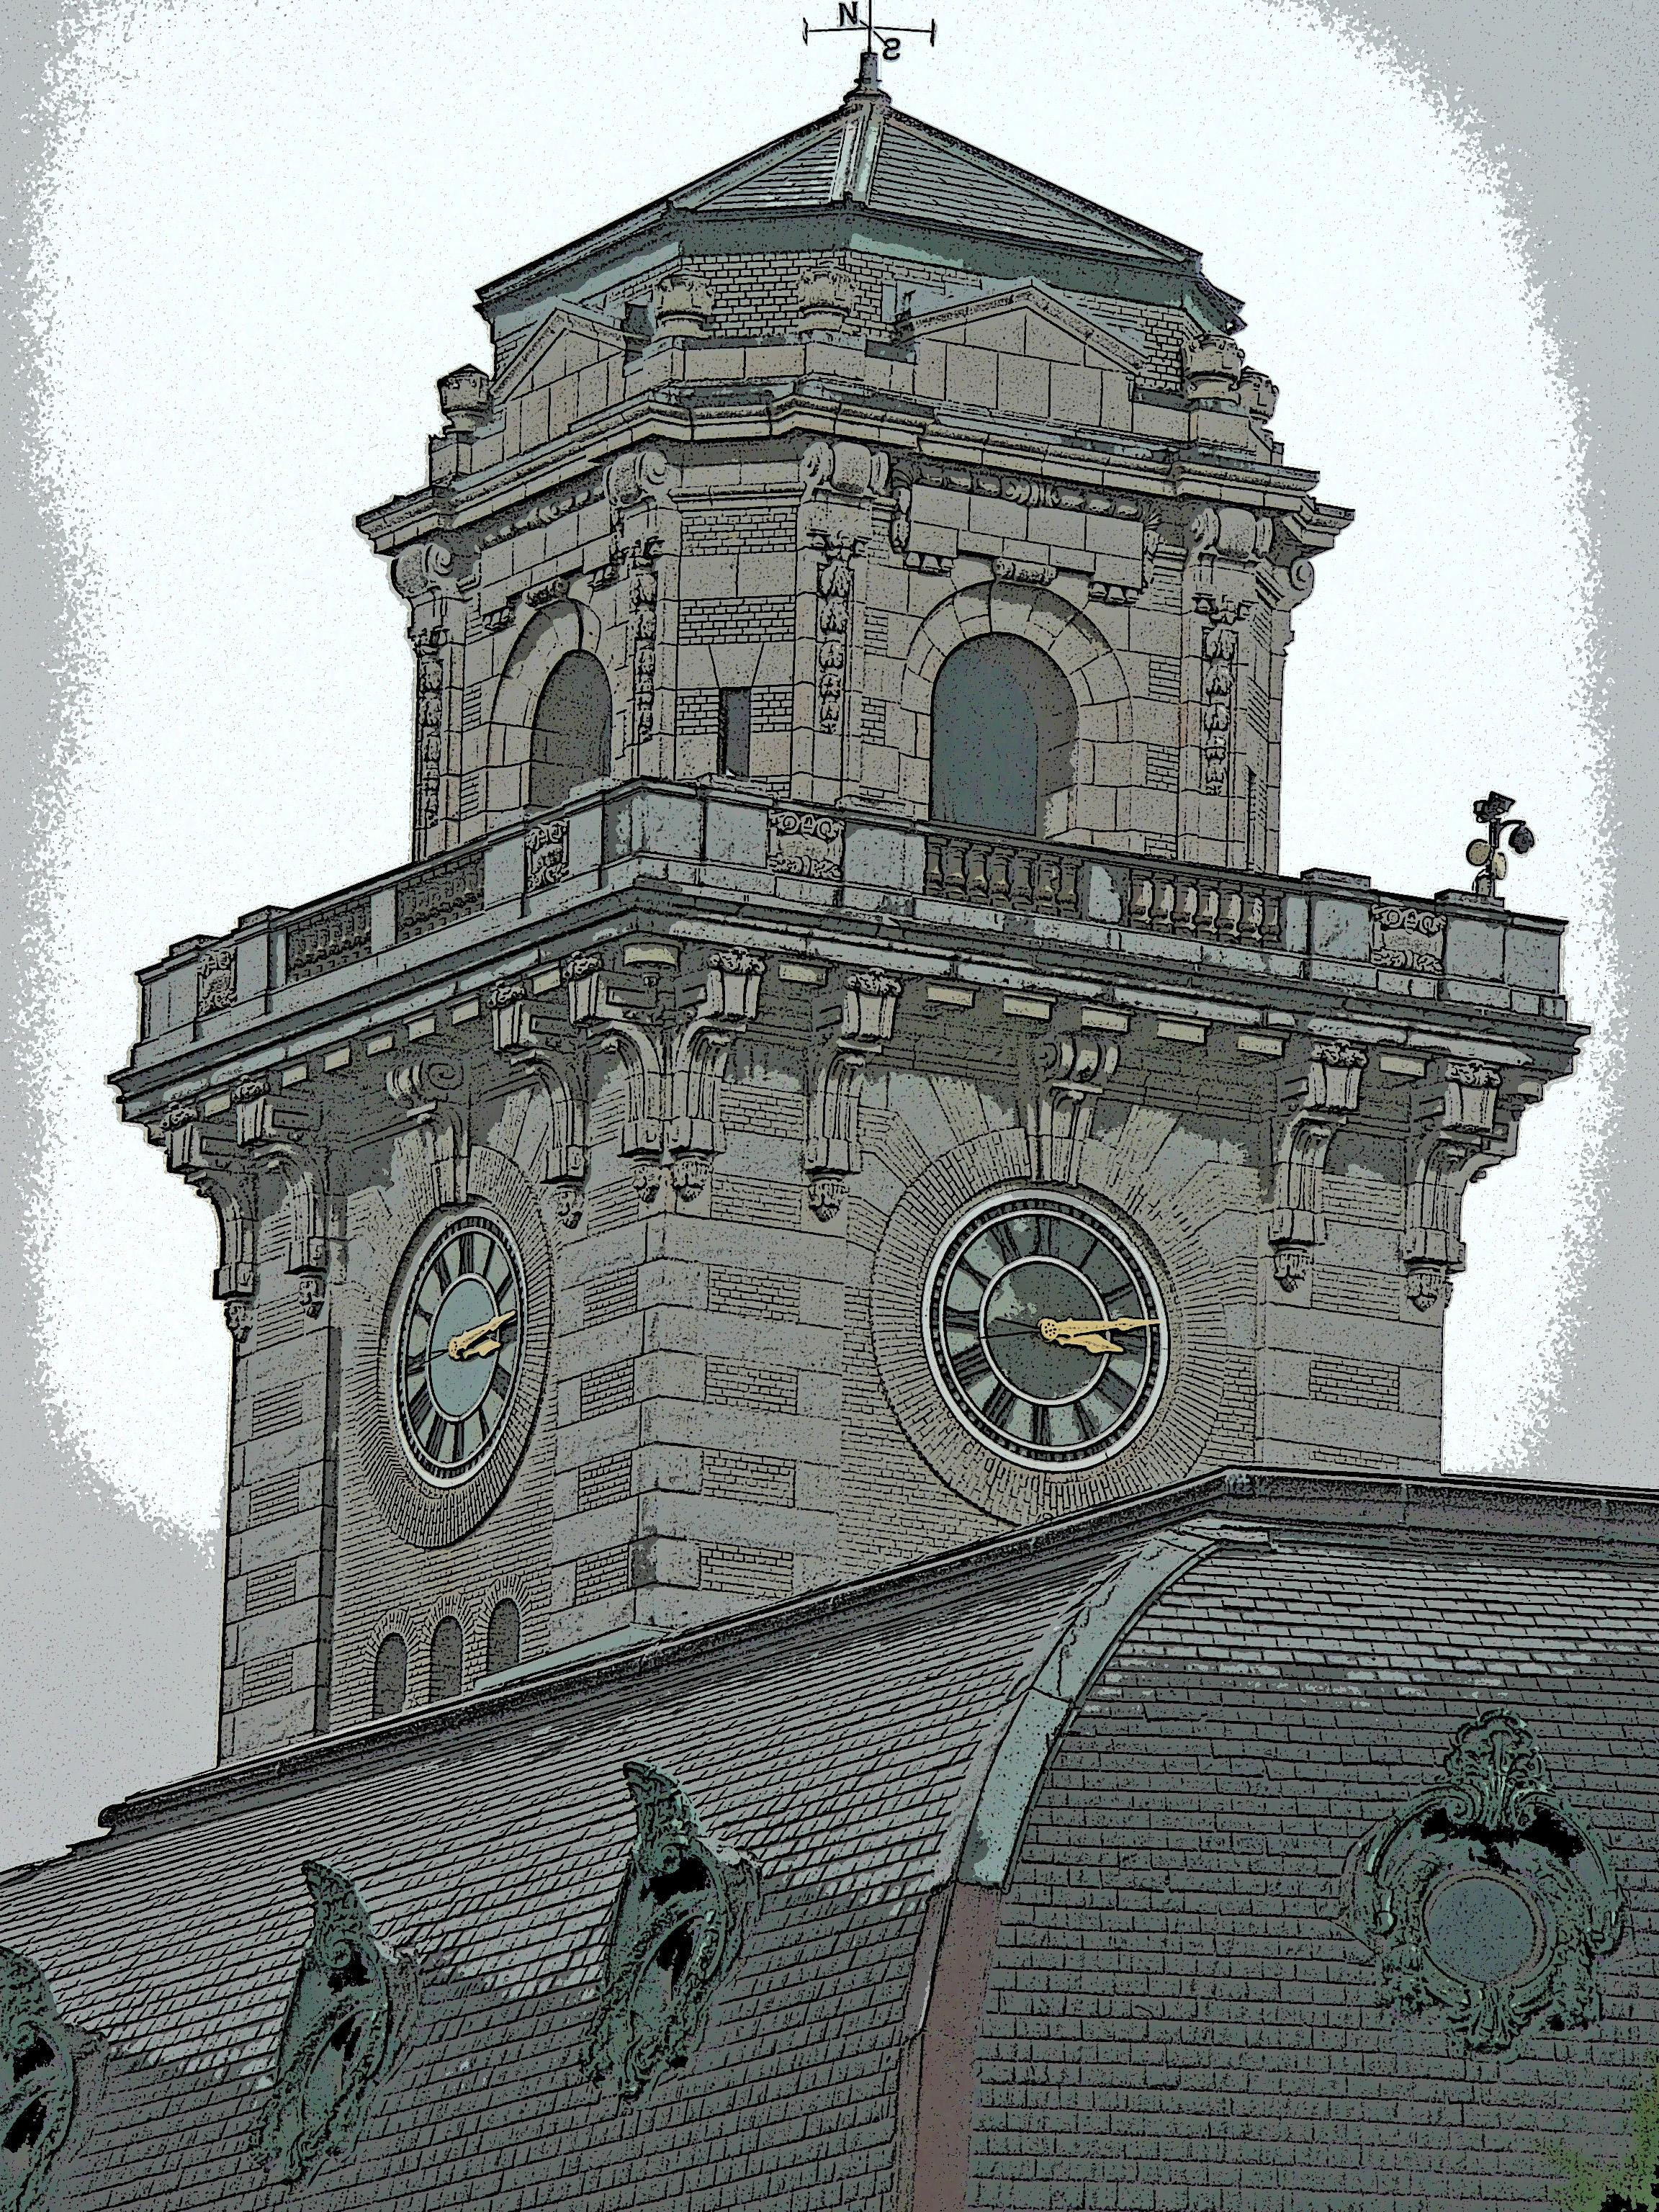 Naval Academy Clock Tower